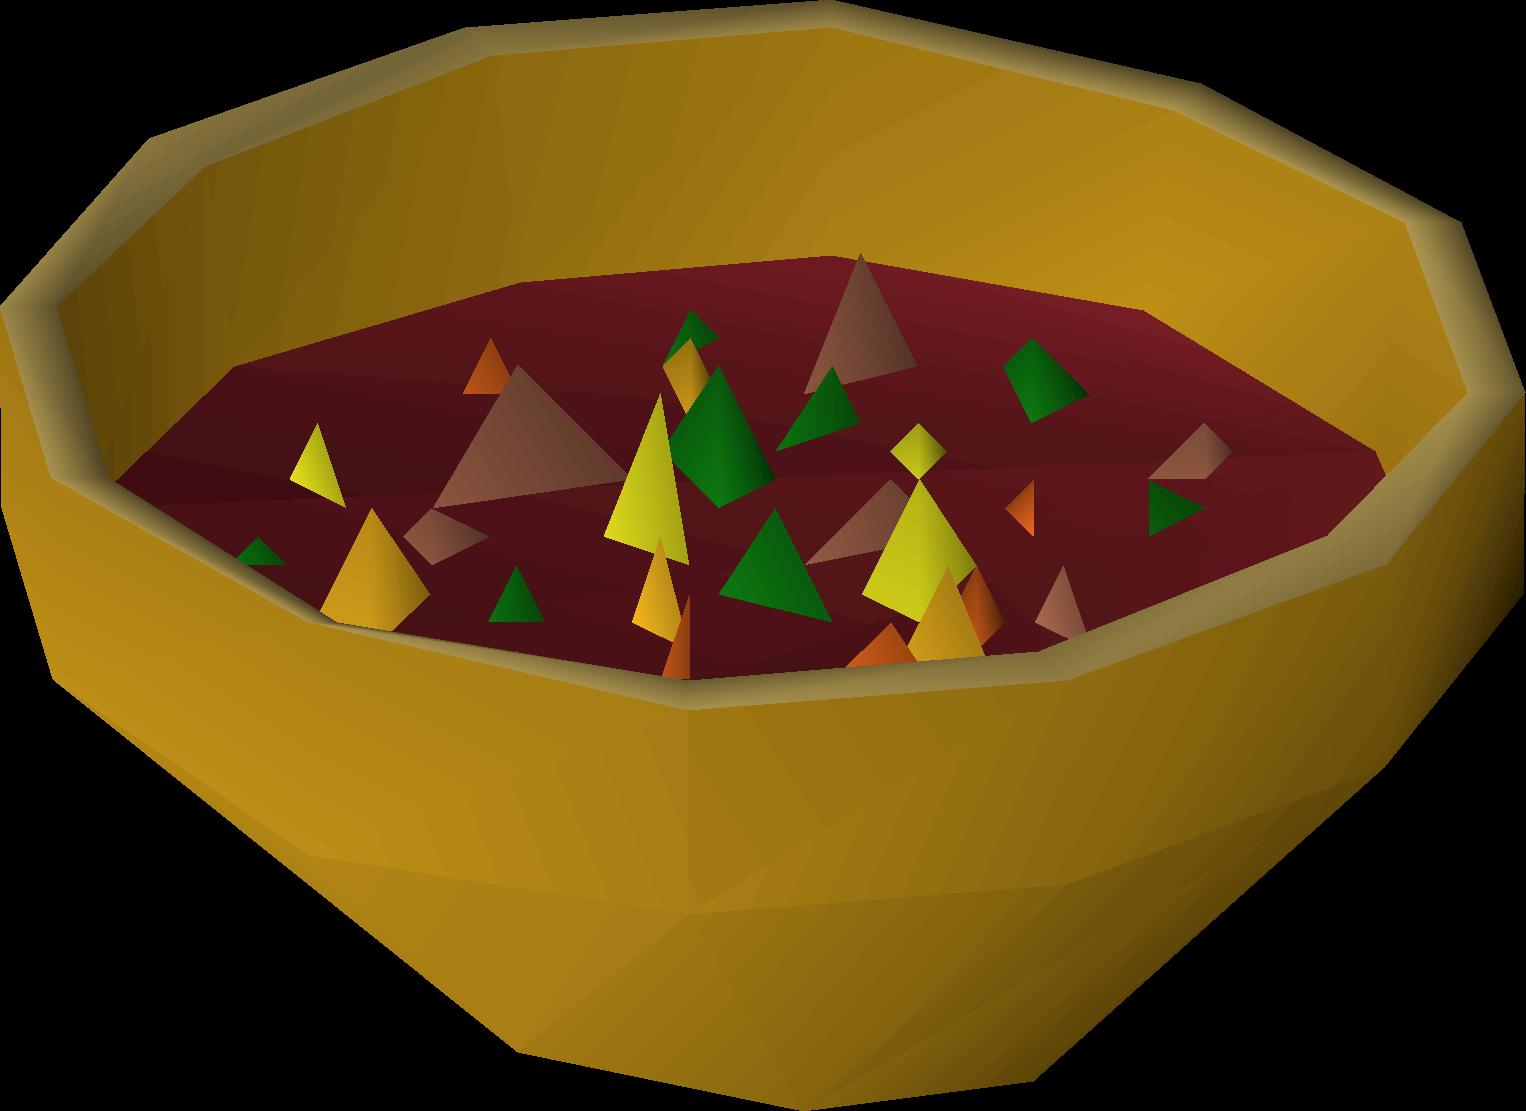 Chilli con carne - OSRS Wiki